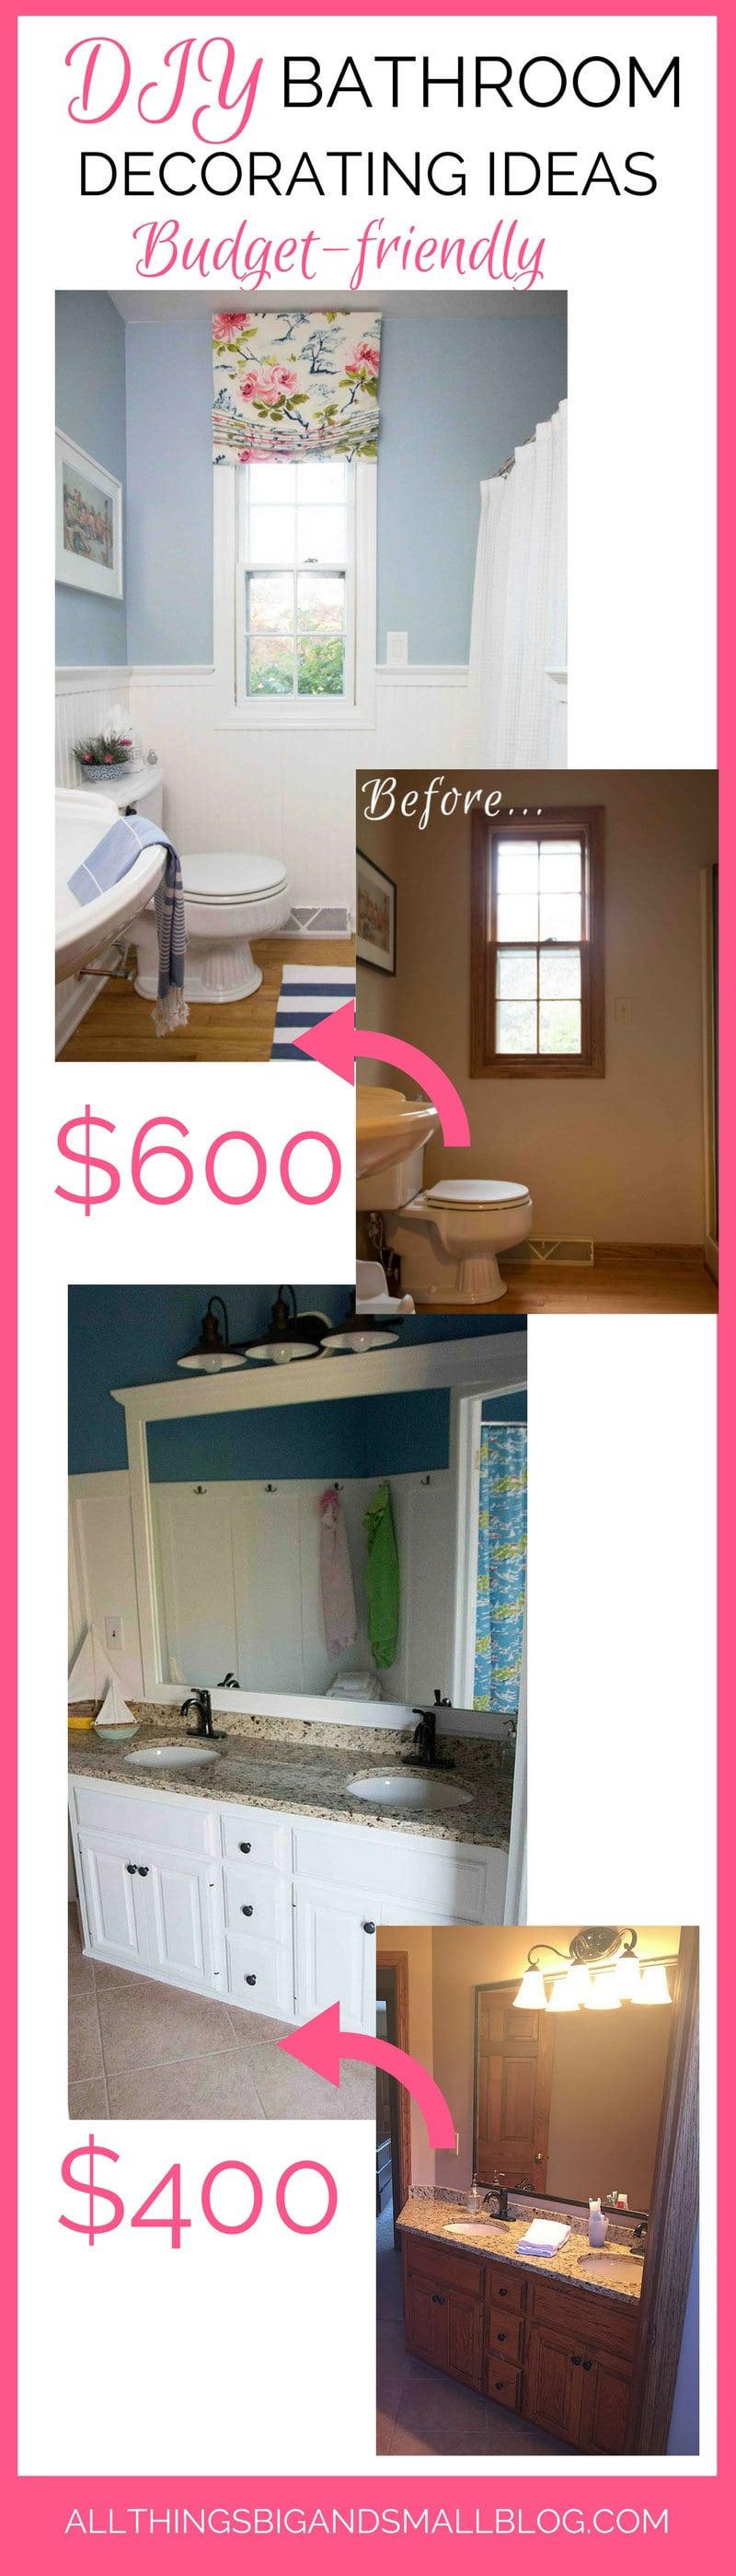 Bathroom Decorating Ideas The Best BudgetFriendly Ideas - Budget friendly bathroom remodel for bathroom decor ideas